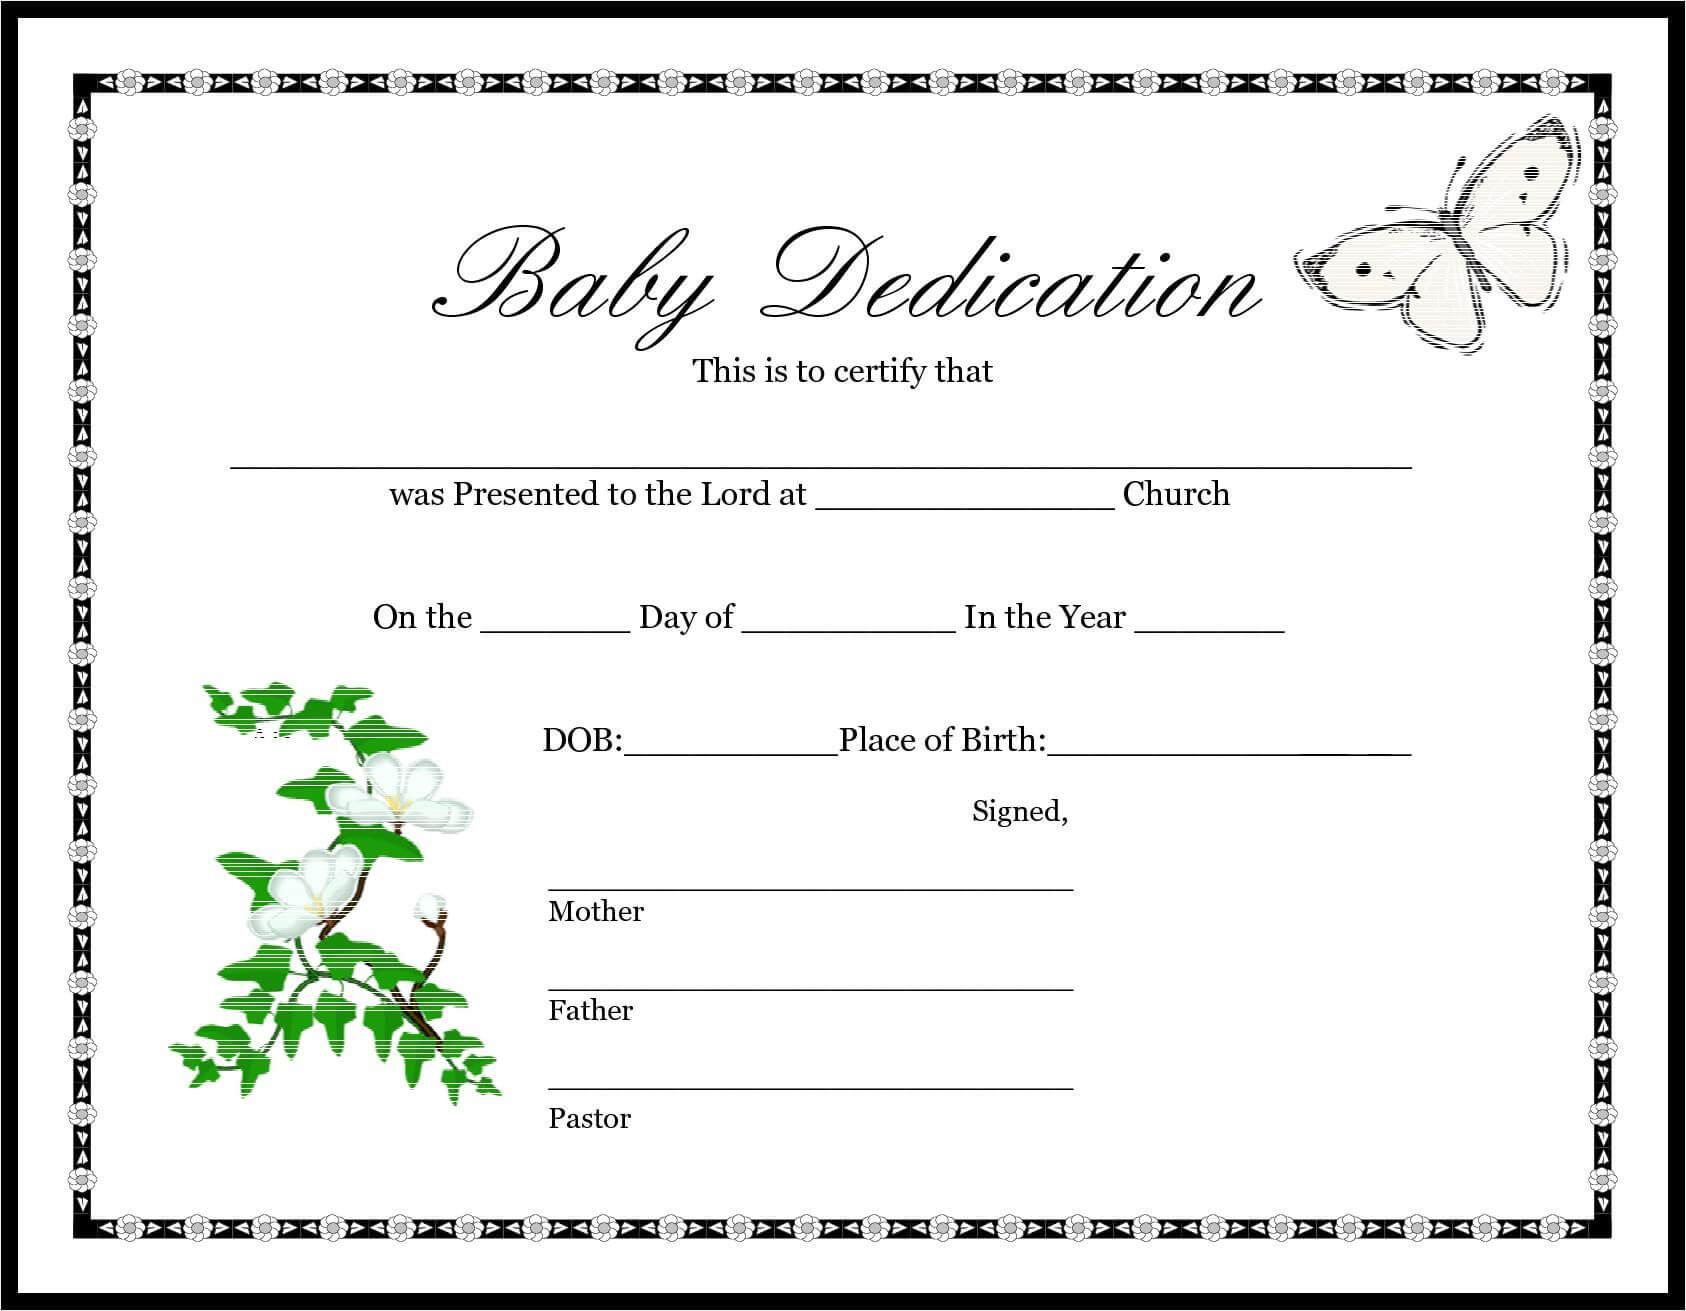 013 Appealing Official Birth Certificate Template Sample Regarding Baby Dedication Certificate Template